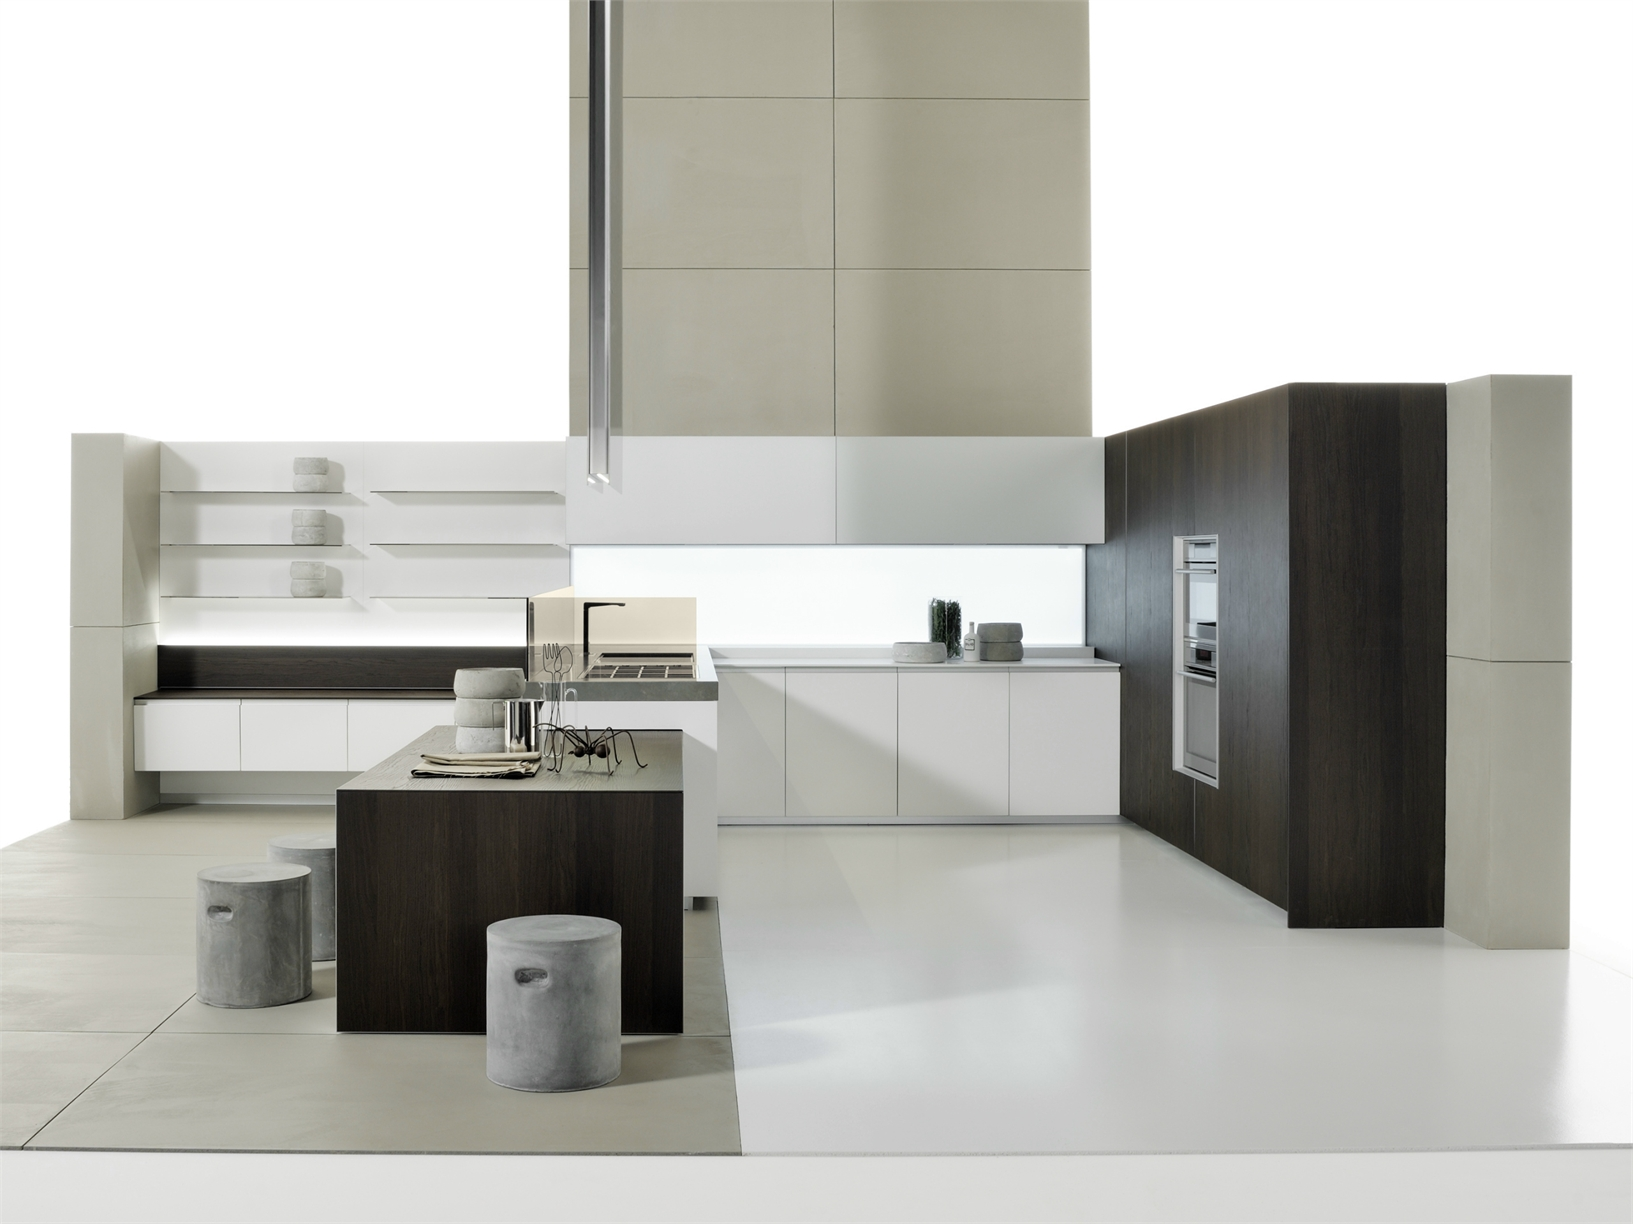 Emejing Ernestomeda Cucine Catalogo Images - Ideas & Design 2017 ...